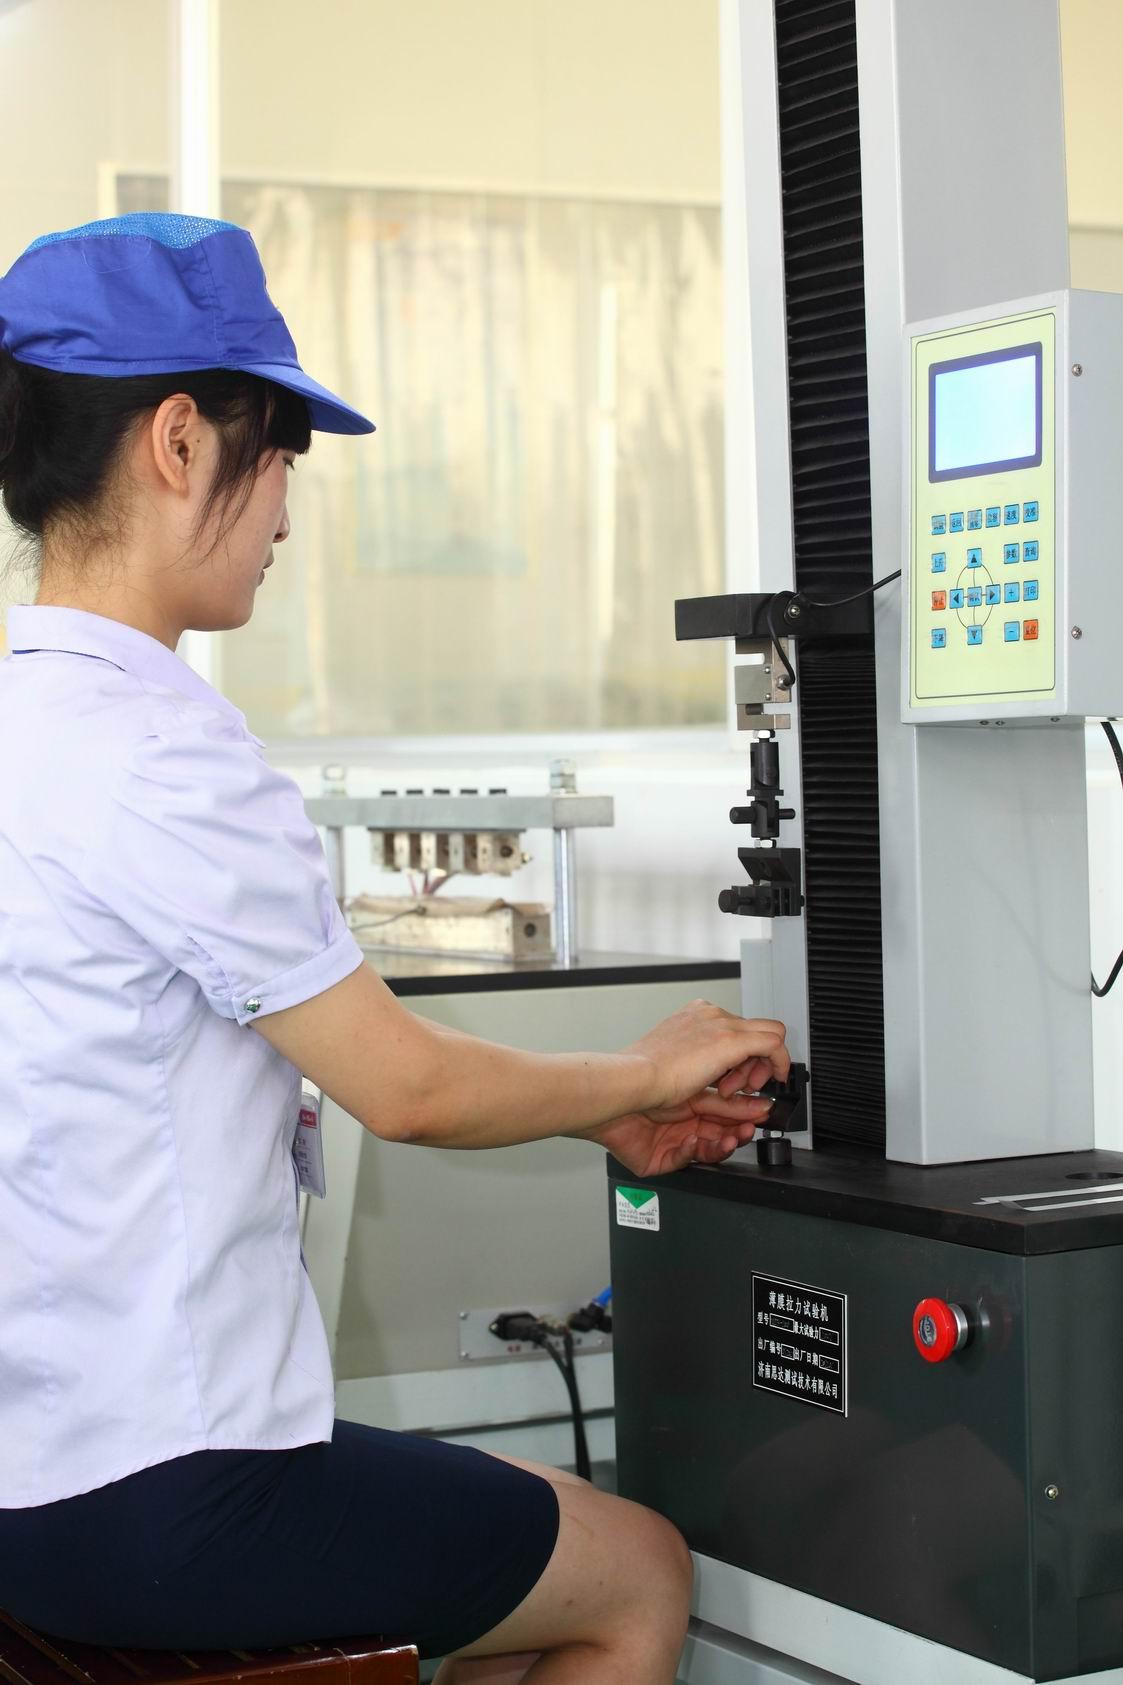 QC extention test machine